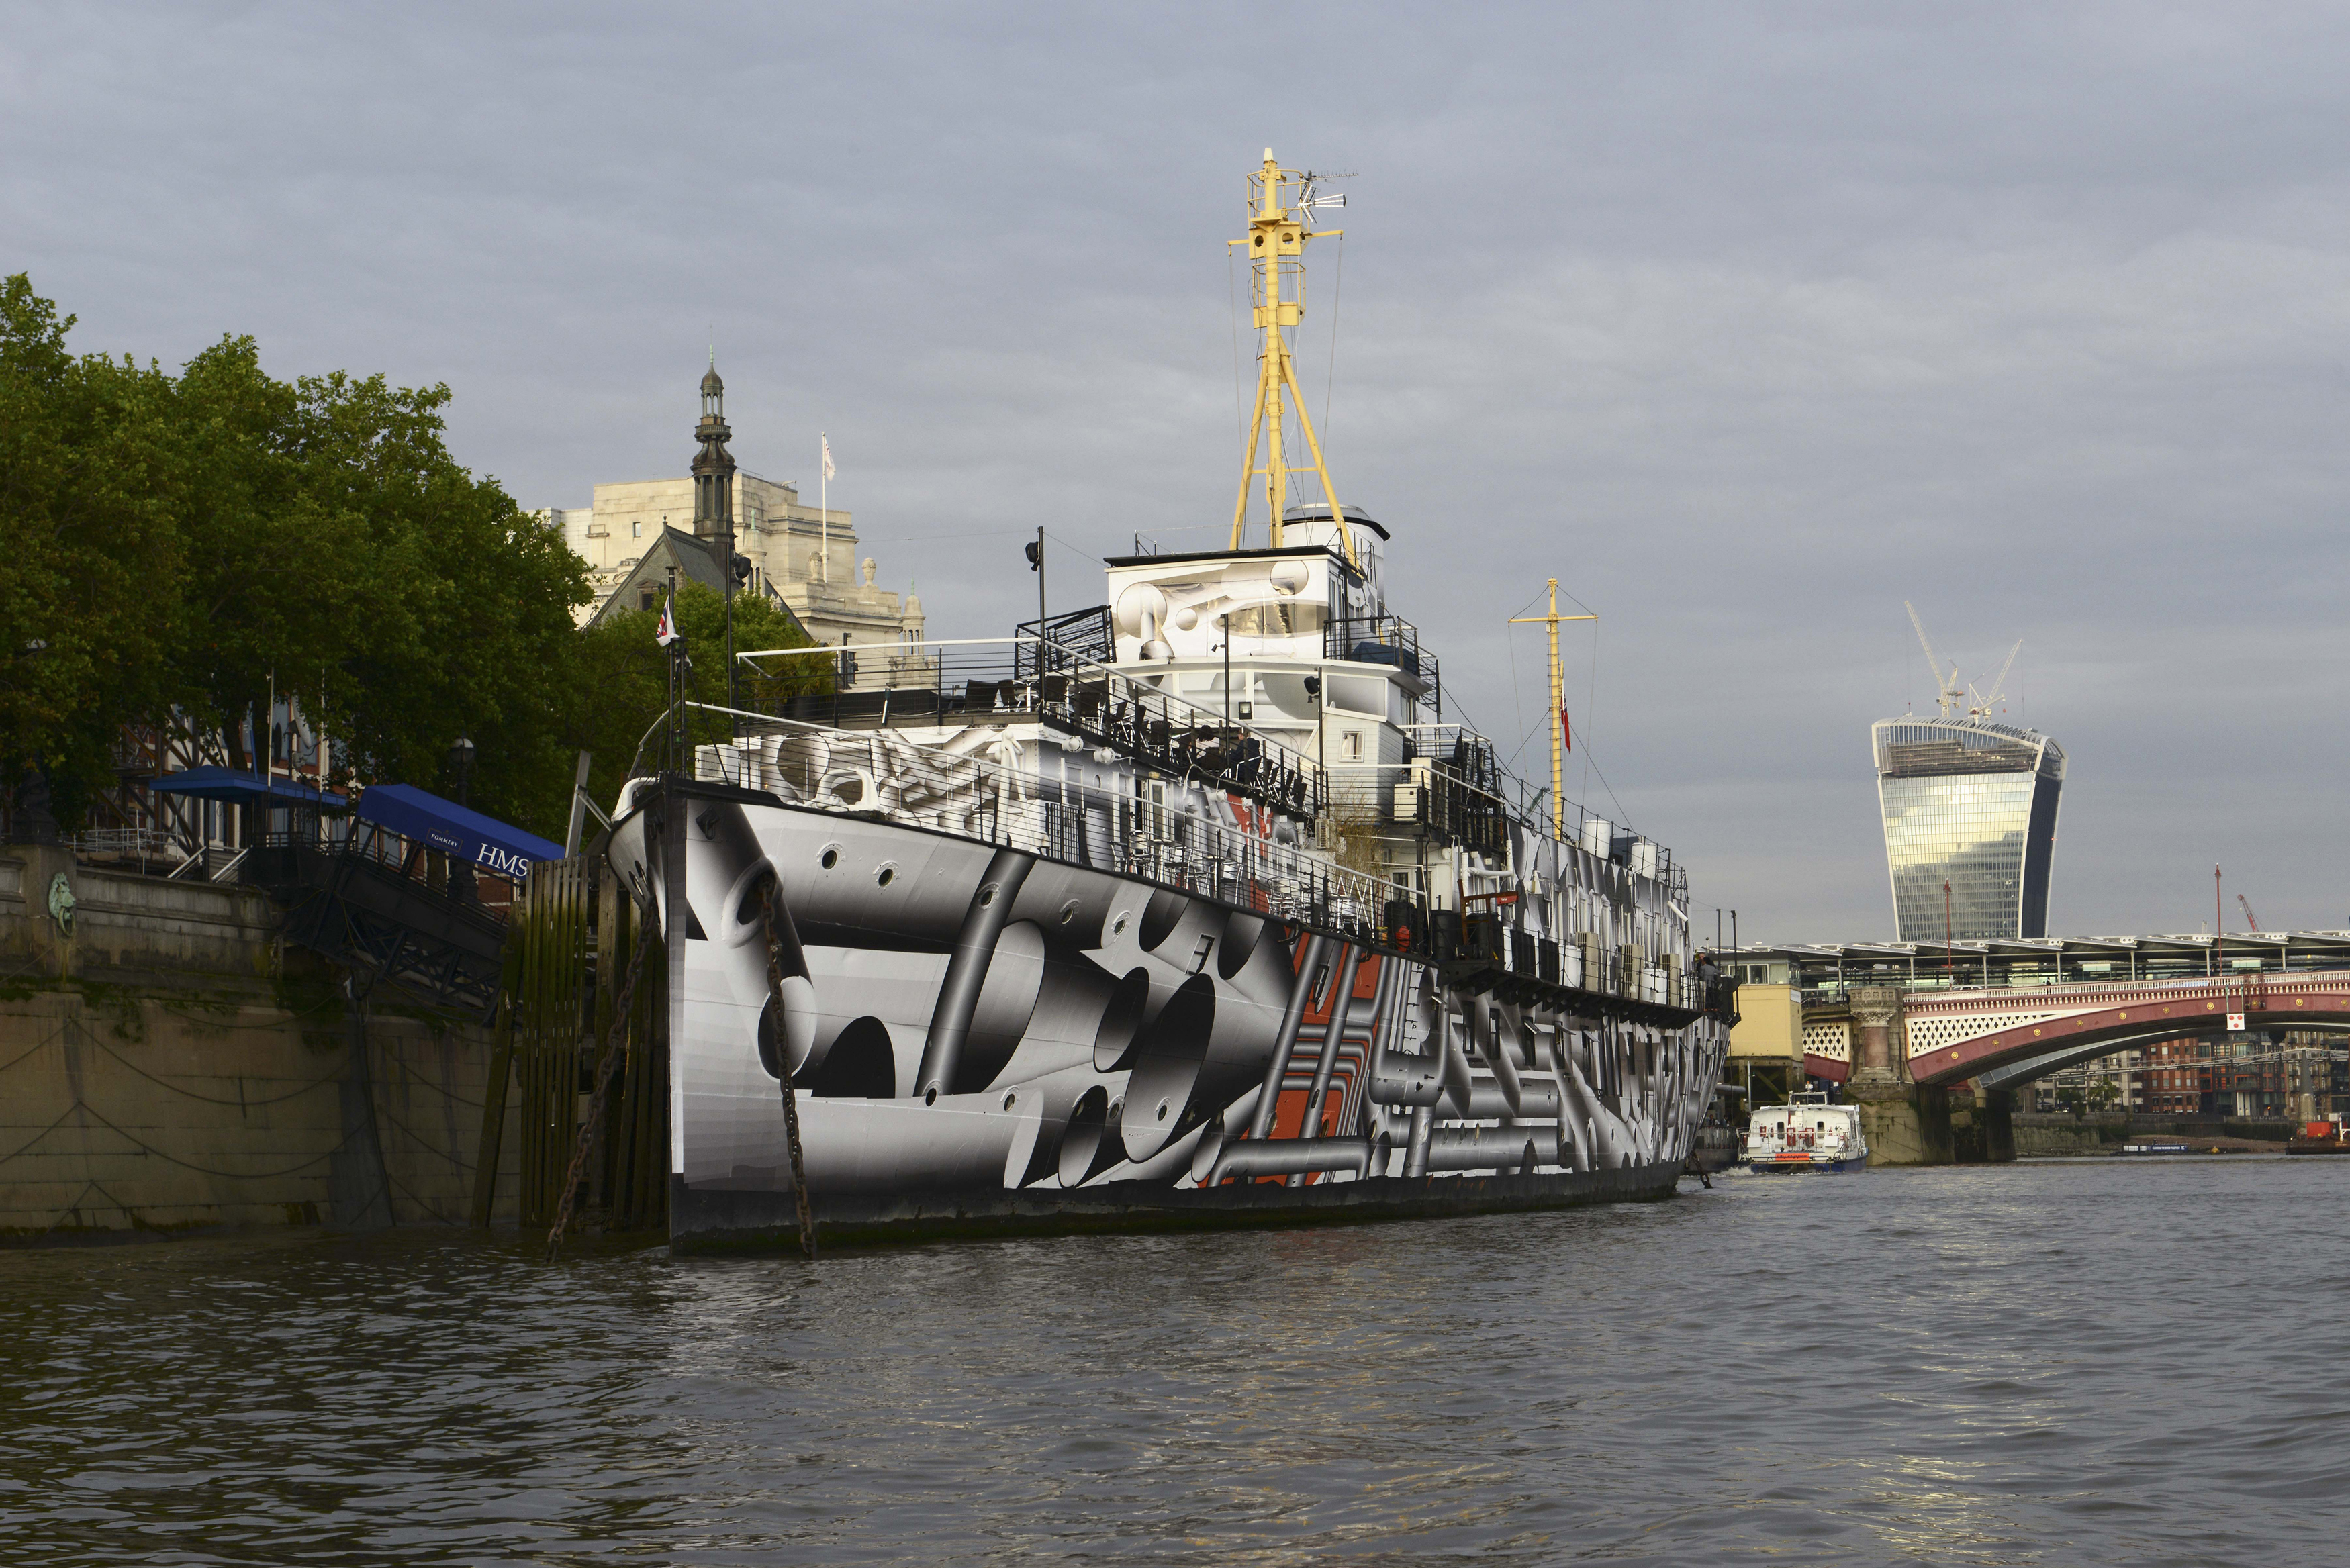 DAZZLE SHIP LONDON